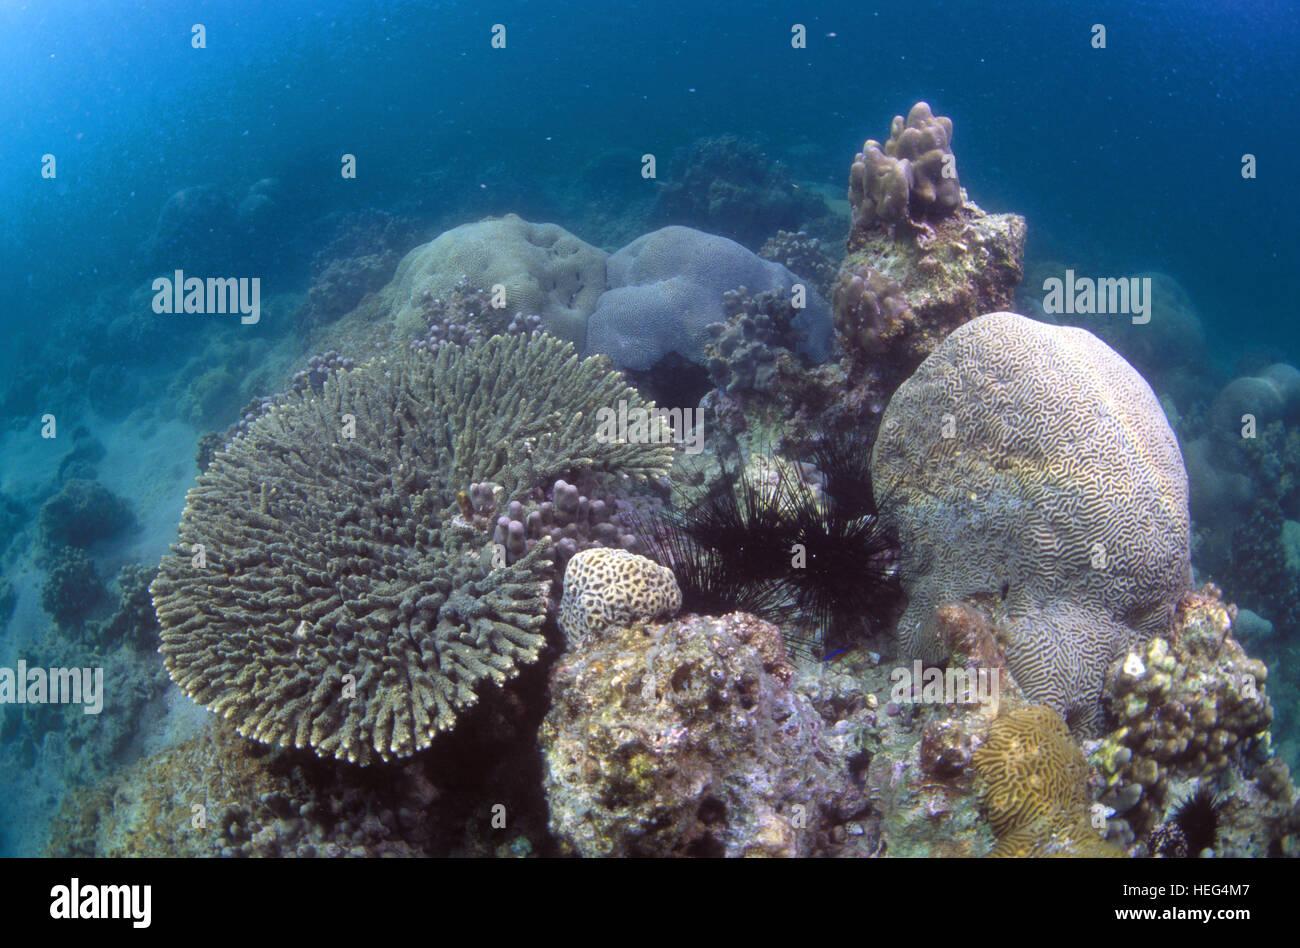 Persian gulf coral reef. Umm Al-Maradem Island. Kuwait - Stock Image